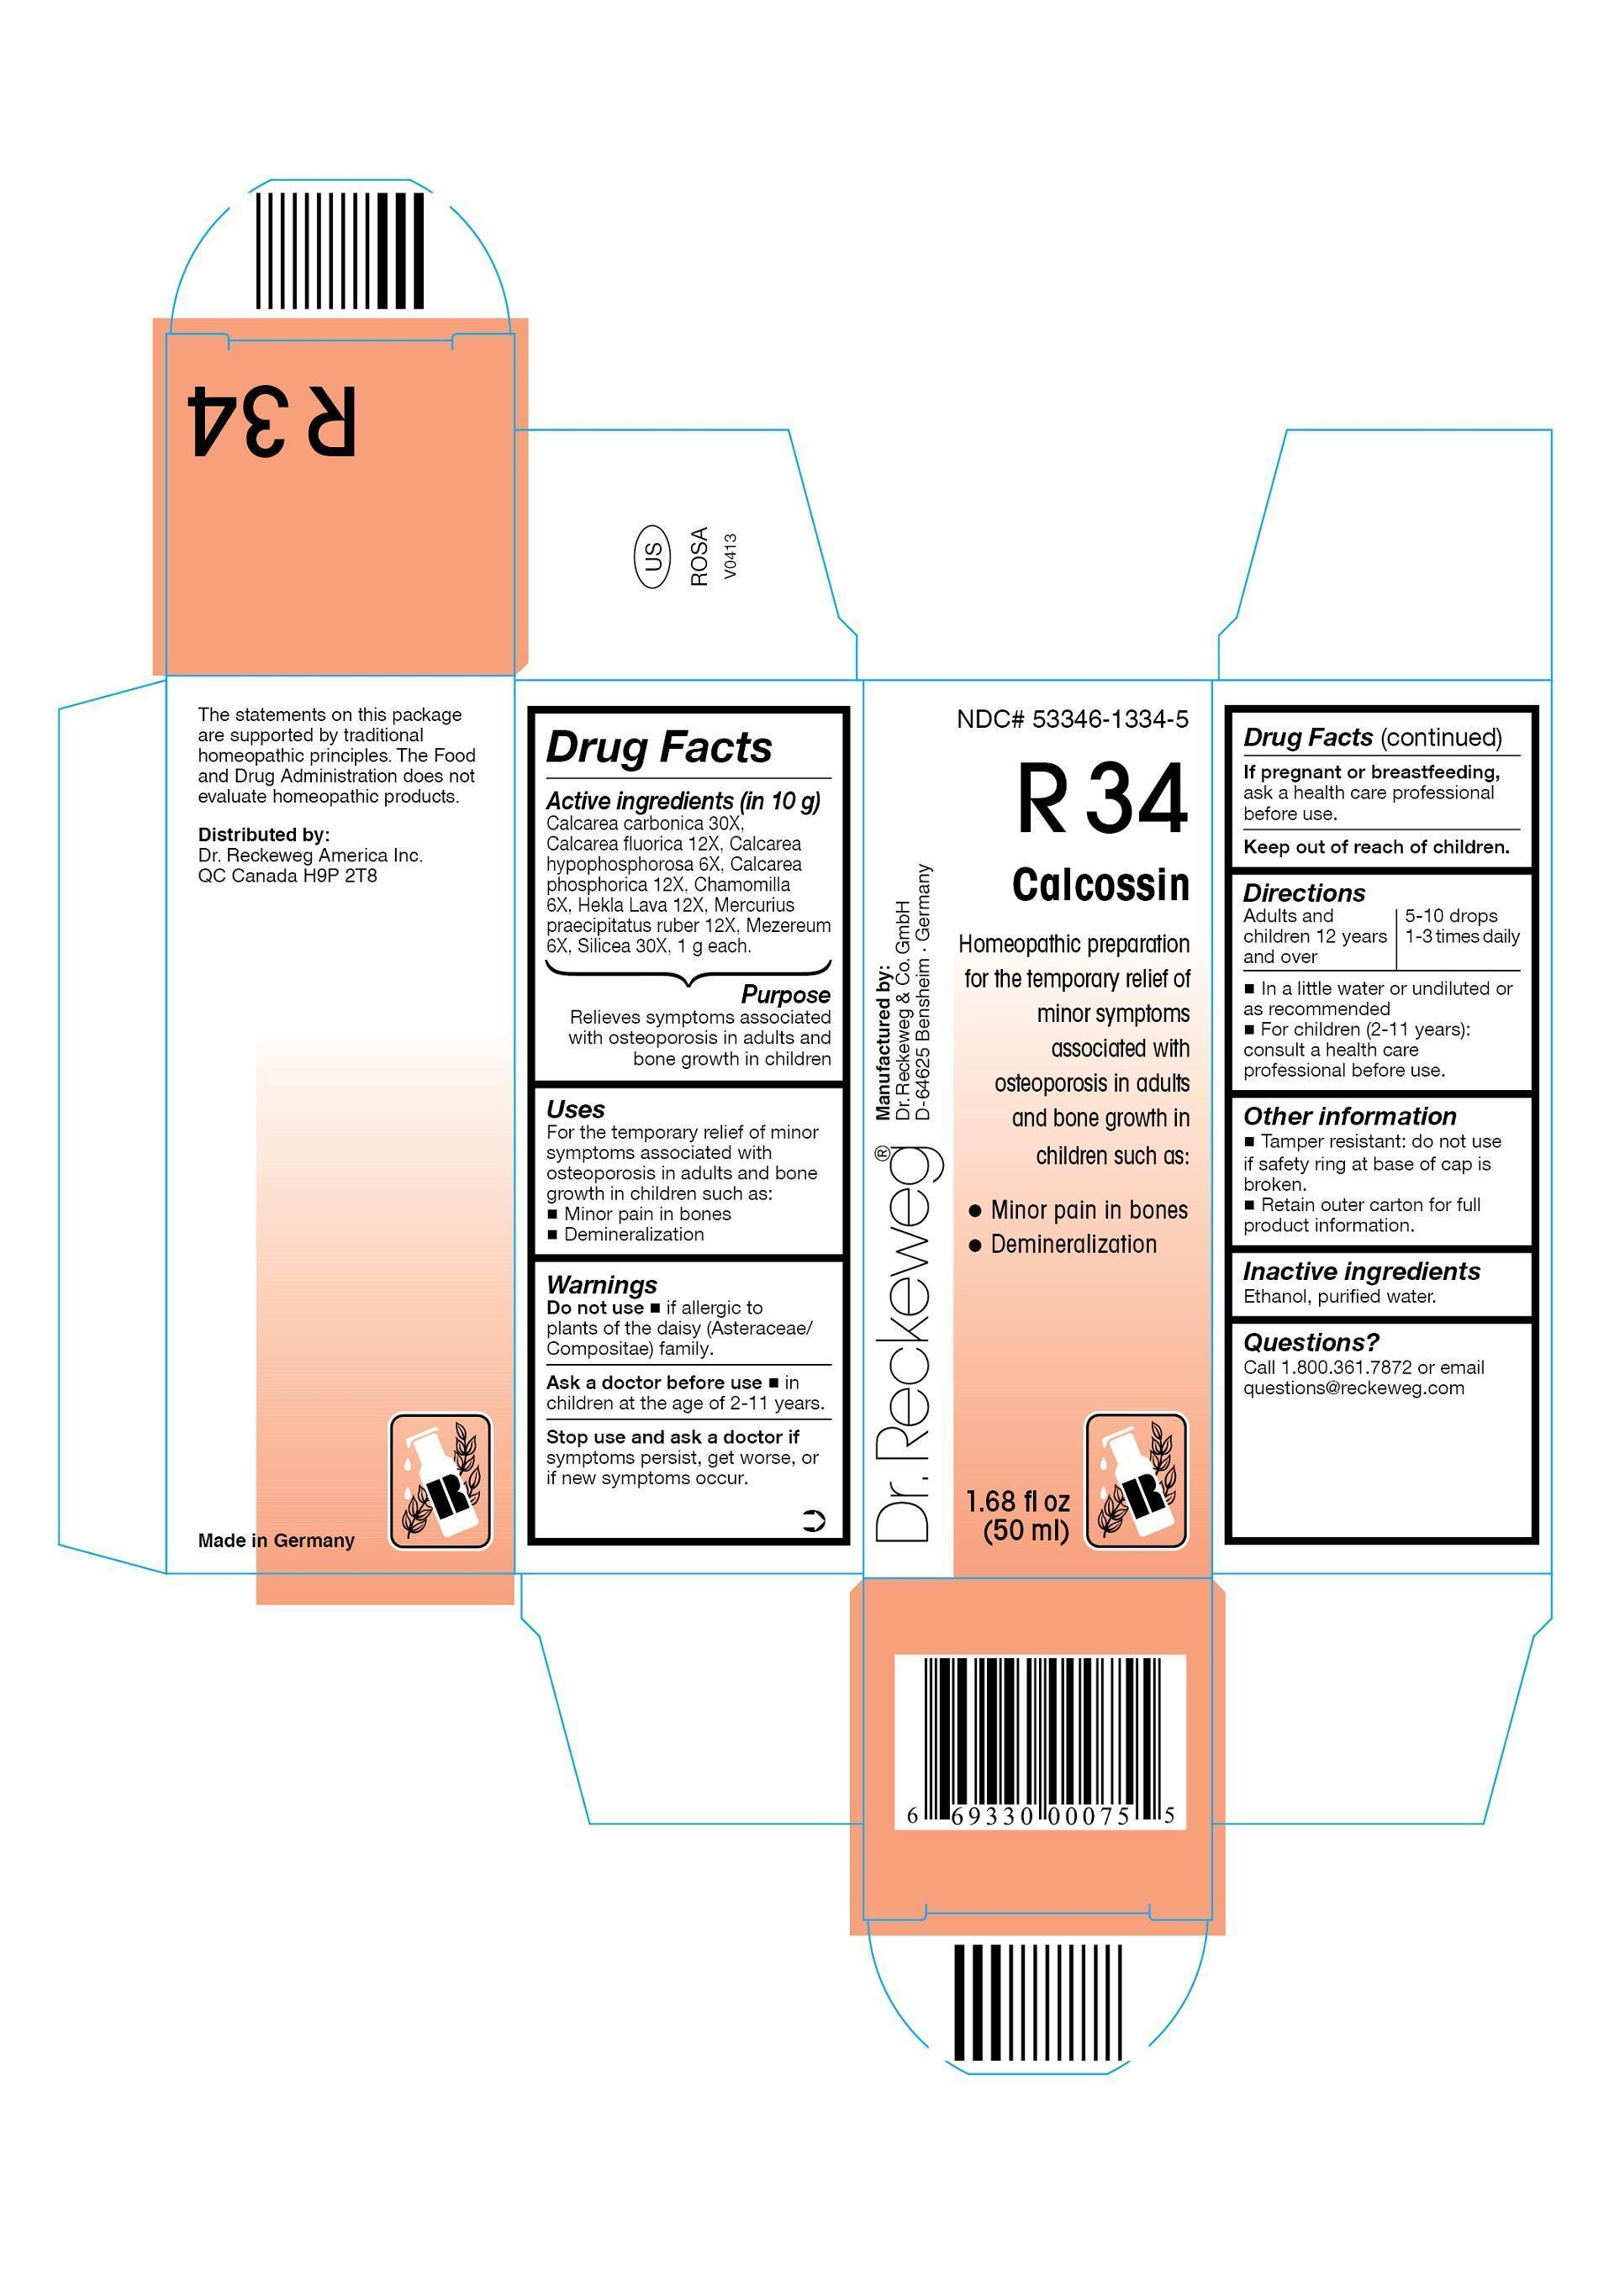 Dr. Reckeweg R34 Calcossin Combination Product (Calcarea Carbonica 30x, Calcarea Fluorica 12x, Calcarea Hypophosphorosa 6x, Calcarea Phosphorica 12x, Chamomilla 6x, Hekla Lava 12x, Mercurius Praecipitatus Ruber 12x, Mezereum 6x, Silicea 30x) Liquid [Pharmazeutische Fabrik Dr. Reckeweg & Co]